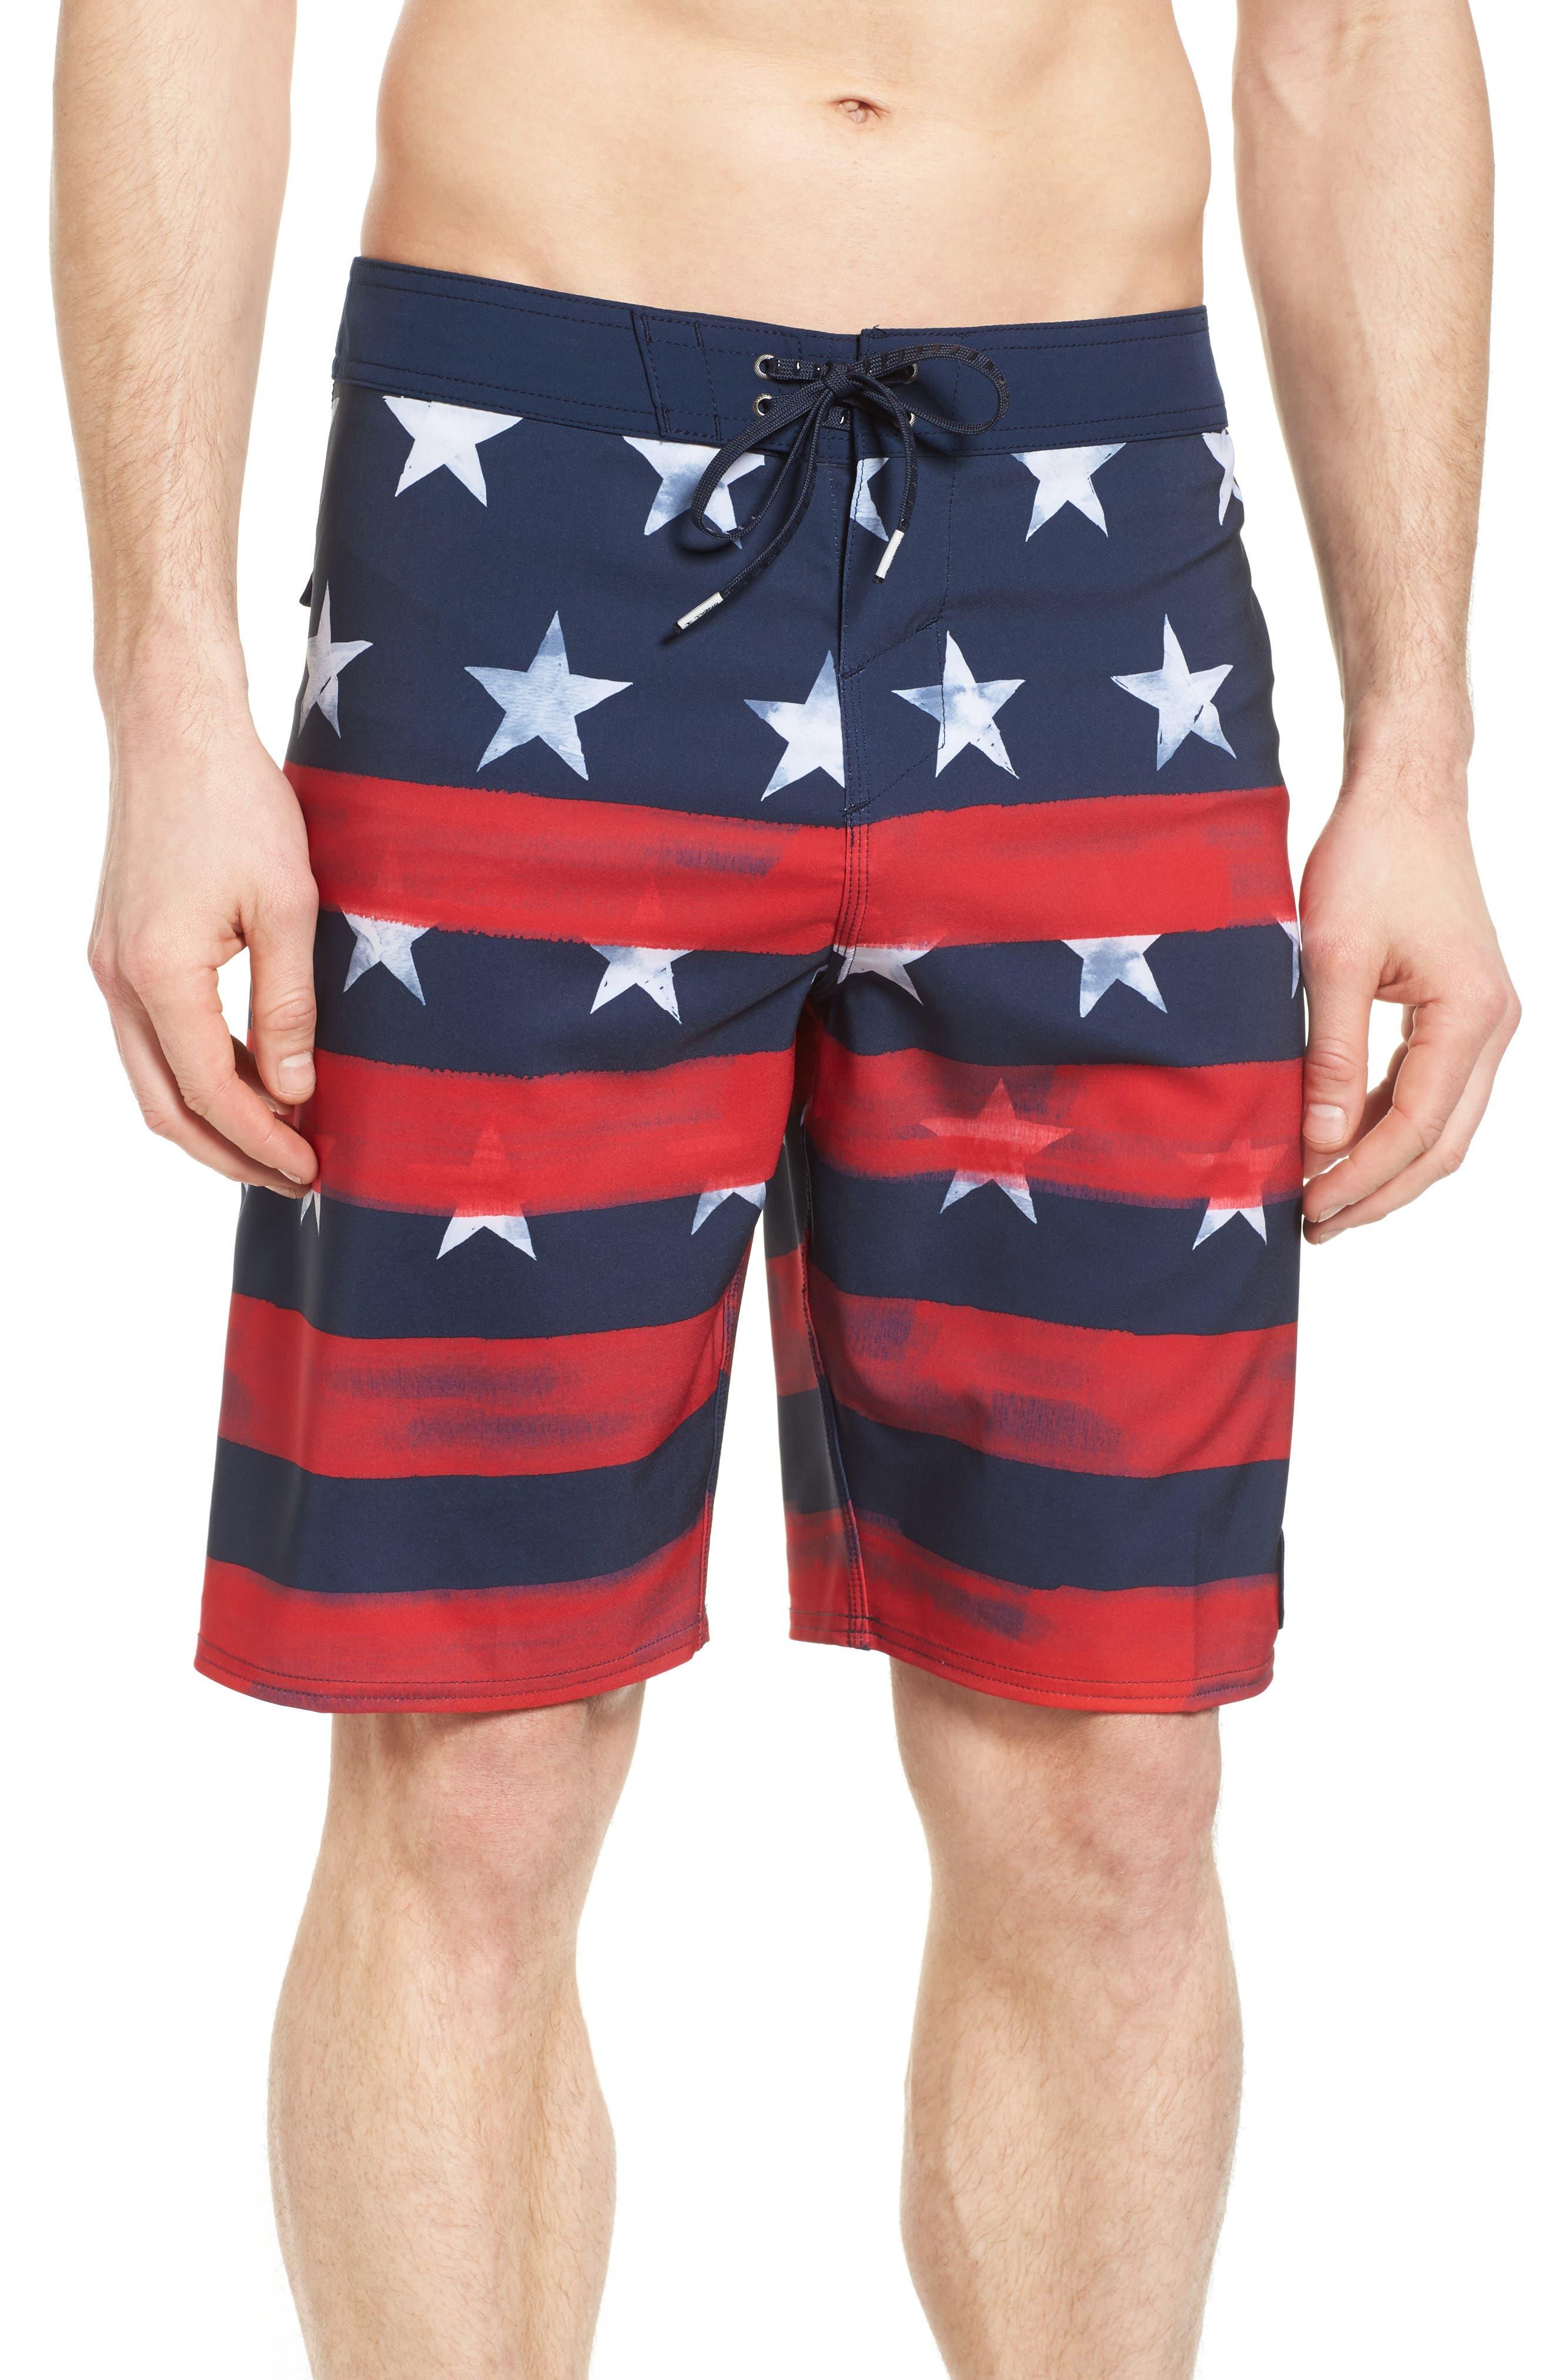 O'Neill Hyperfreak Star Spangled Board Shorts